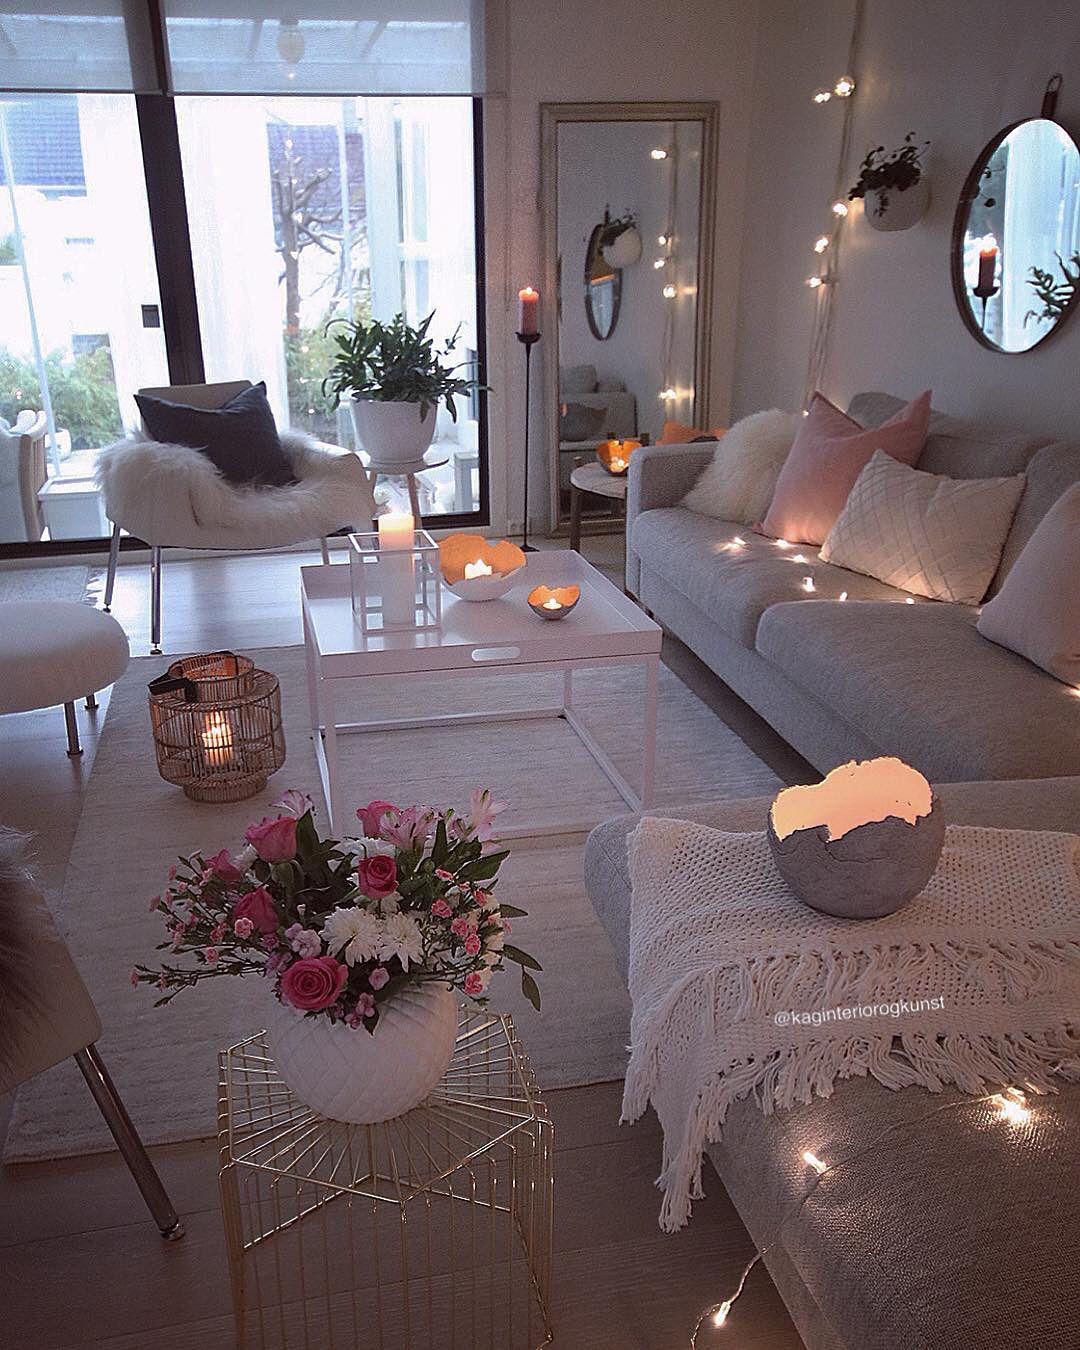 Cute Cozy Living Room Decor Loving The Set Up Pinterest Selfcareoverload ¤ンテリアデザイン ¤ンテリア Å®¶å…· êビング ¤ンテリア Þンション